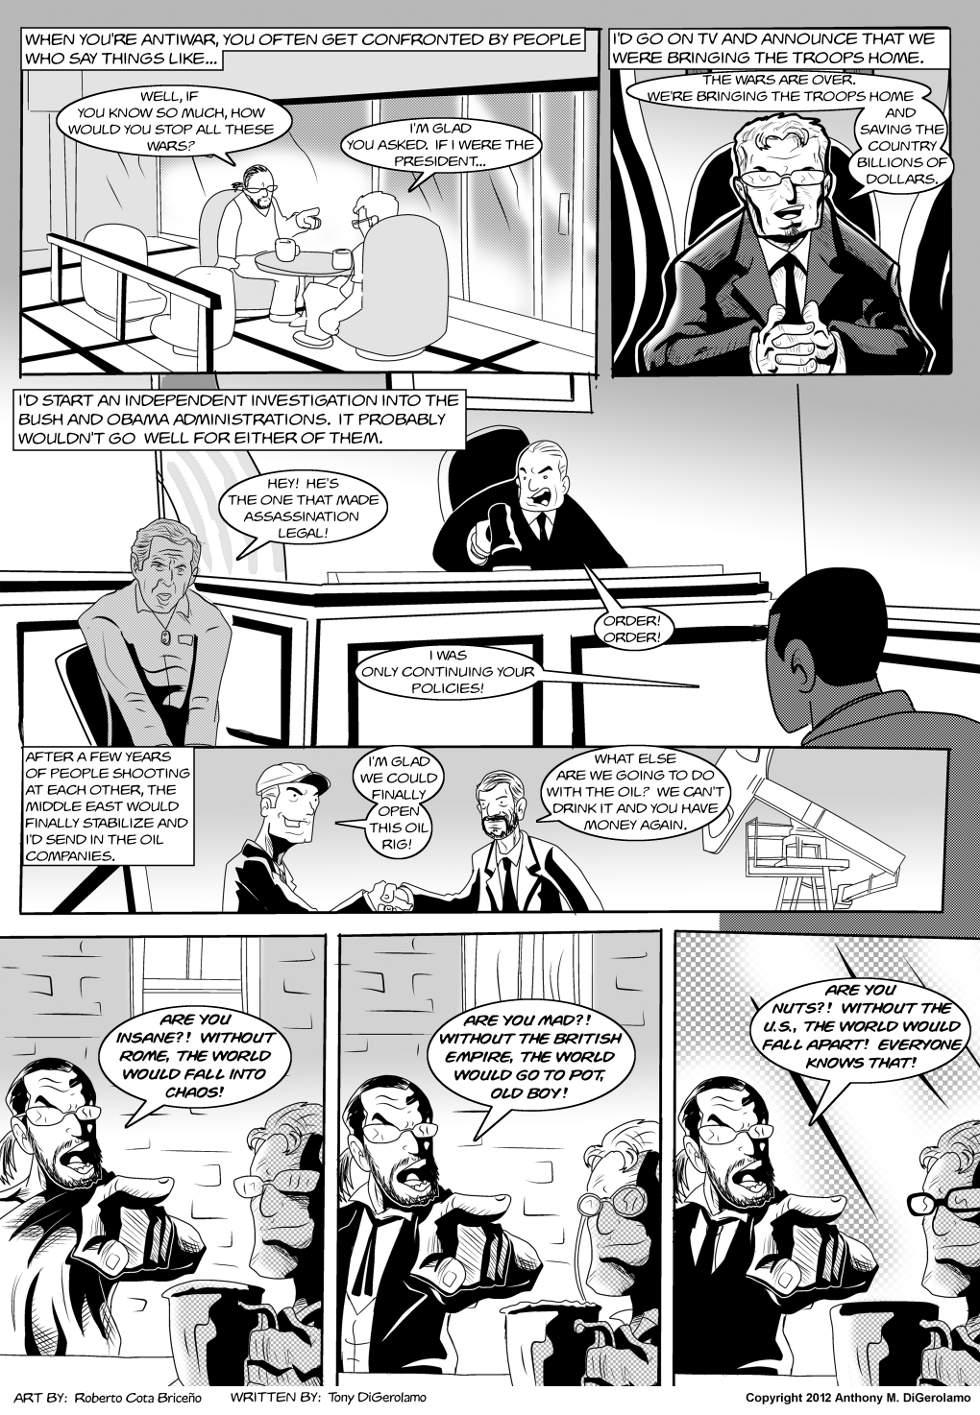 The Antiwar Comic:  A Peacenik's Christmas Wish